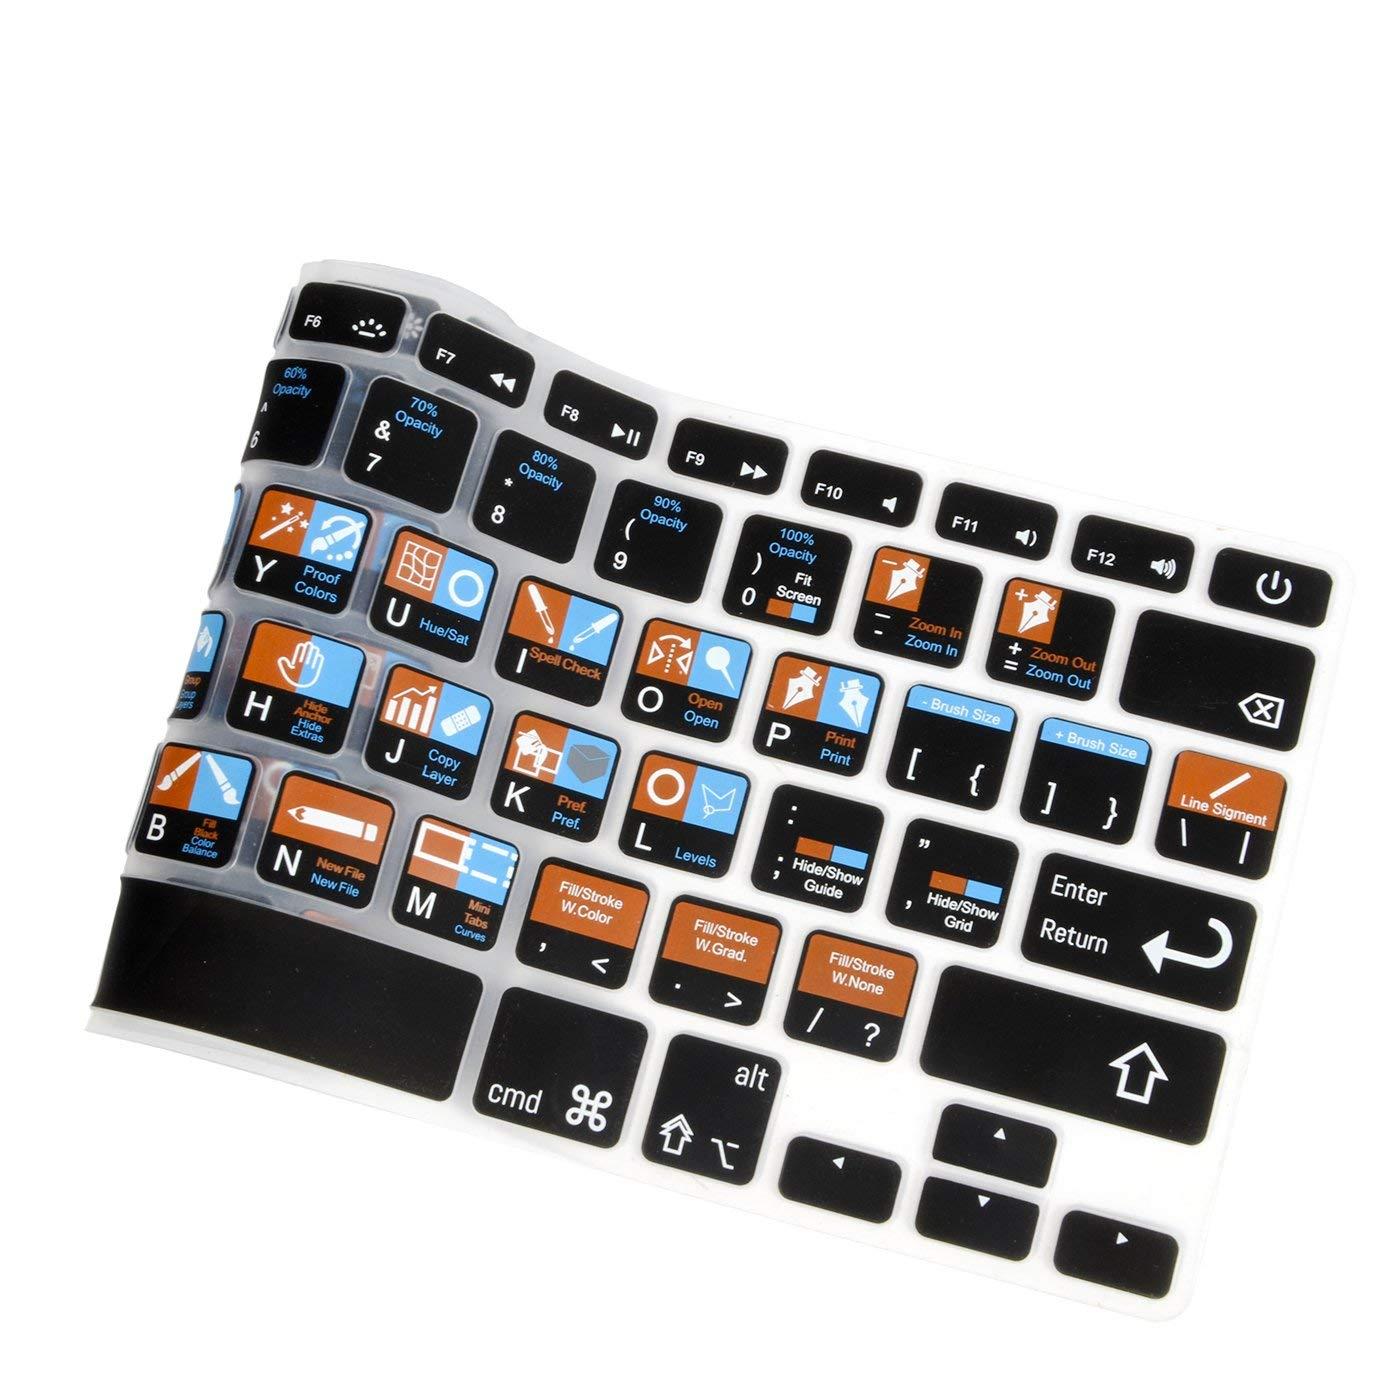 for MacBook Pro Air Retina 13 A1369 A1466 A1425 A1502 15 17 A1278 Silver Shortcut Hotkeys Keyboard Skin Cover